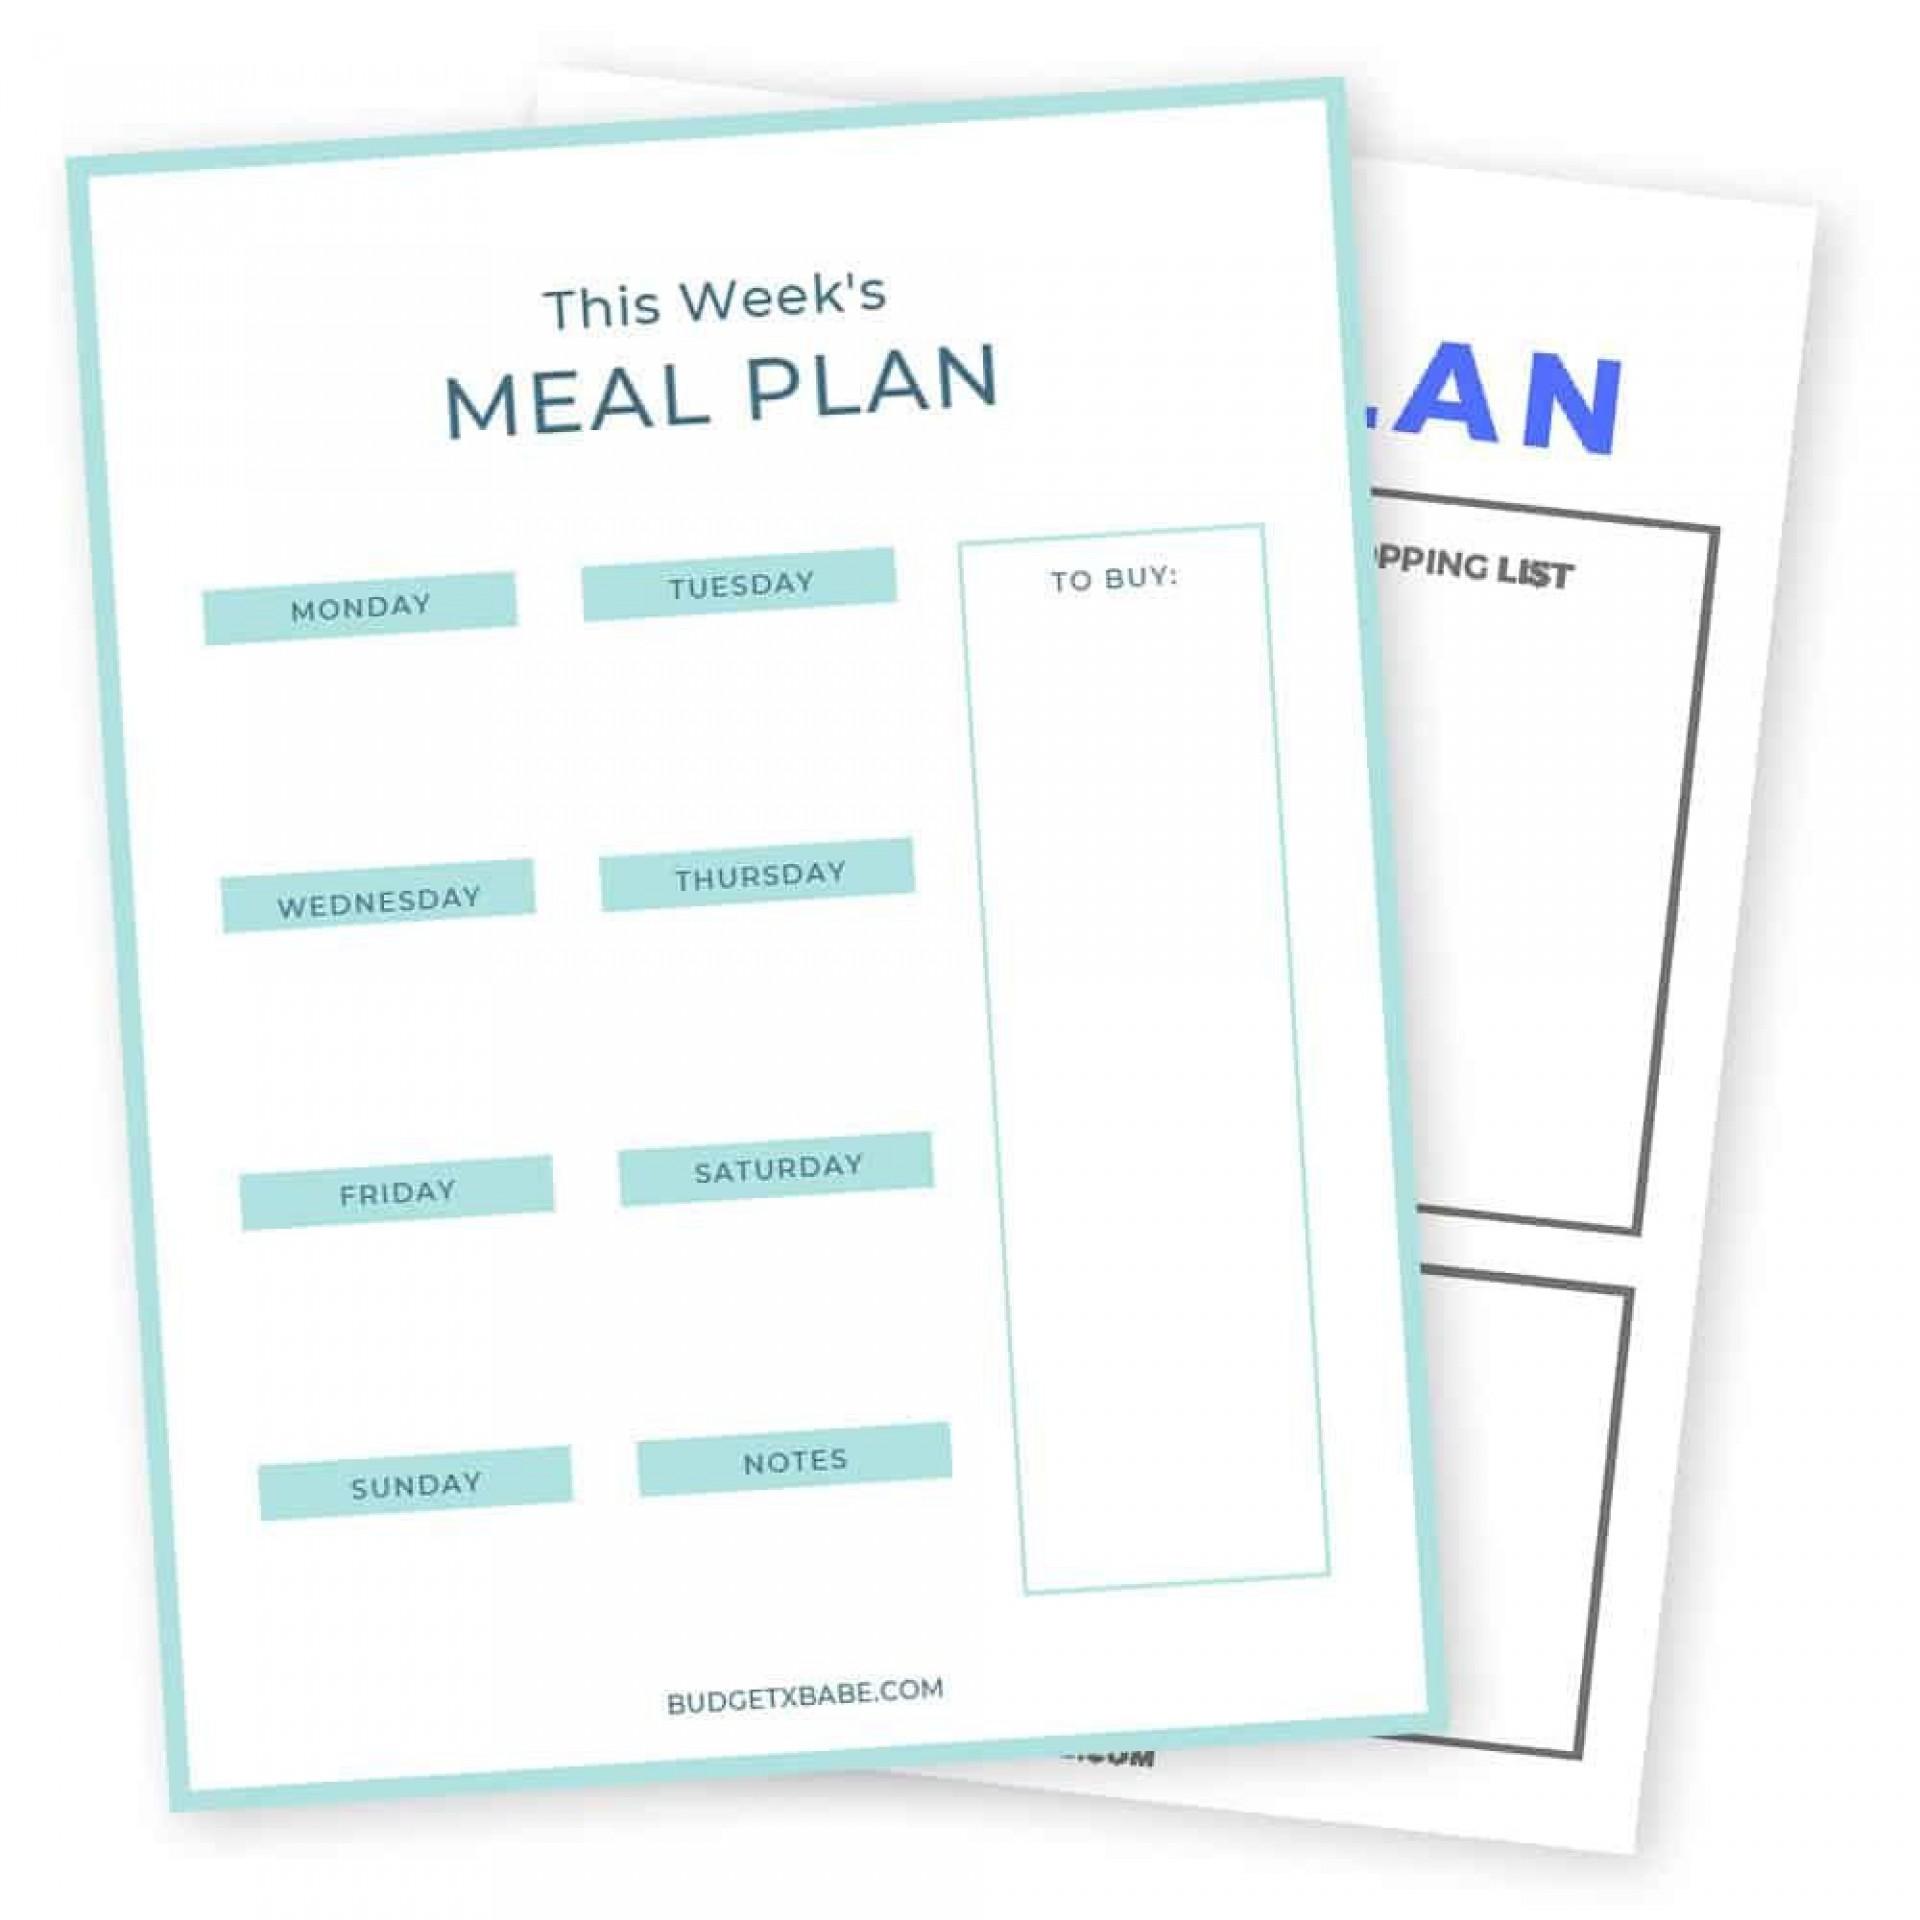 008 Fascinating Weekly Meal Planning Worksheet Pdf High Definition  Free1920